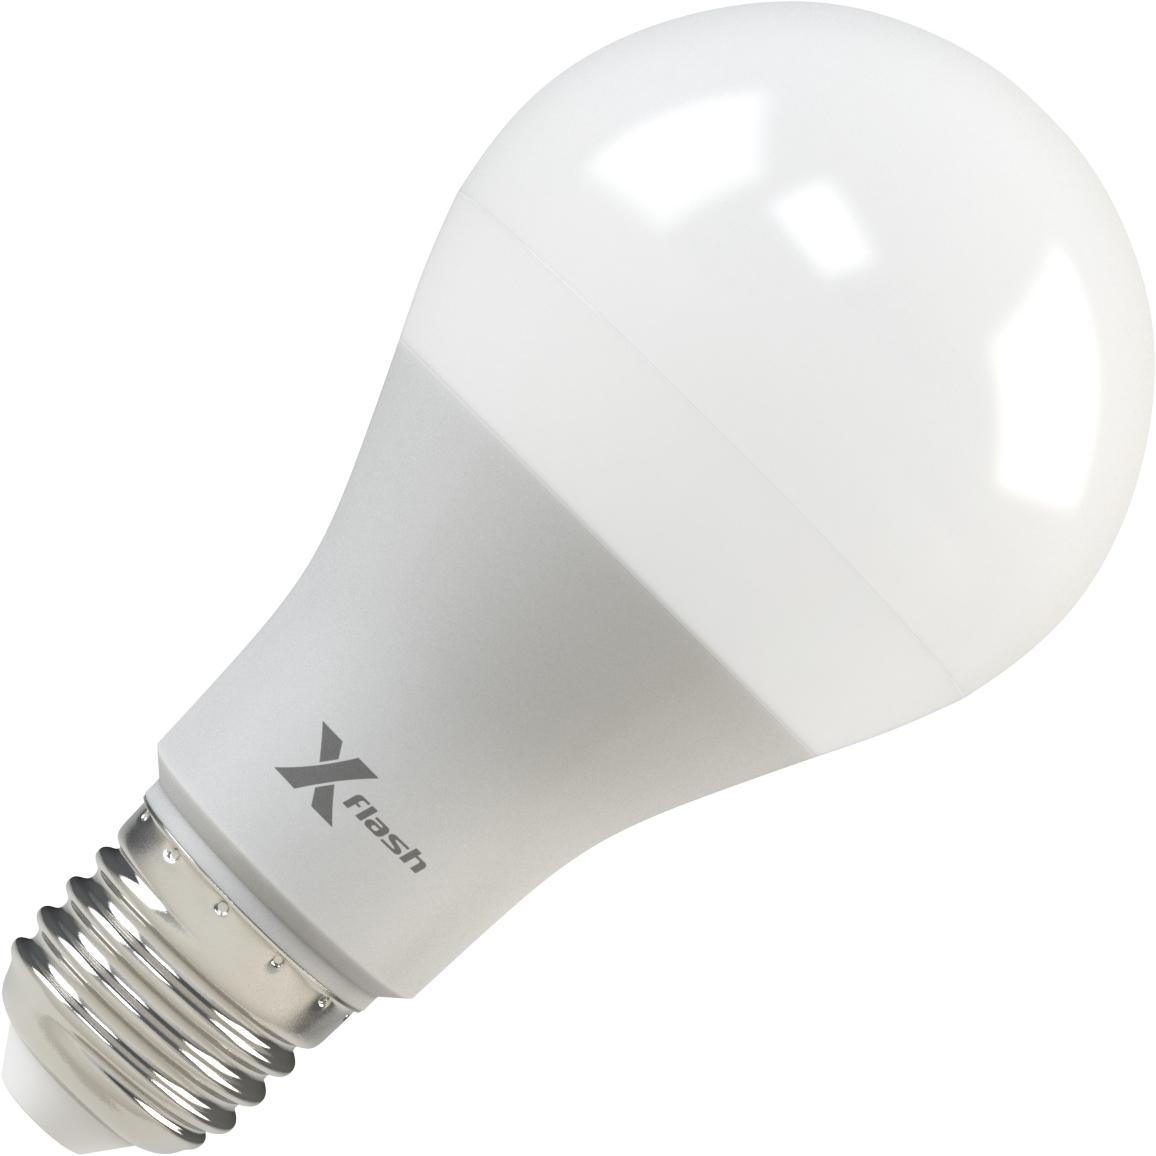 Лампа светодиодная X-flash Xf-e27-a65-p-12w-3000k-12v 10шт